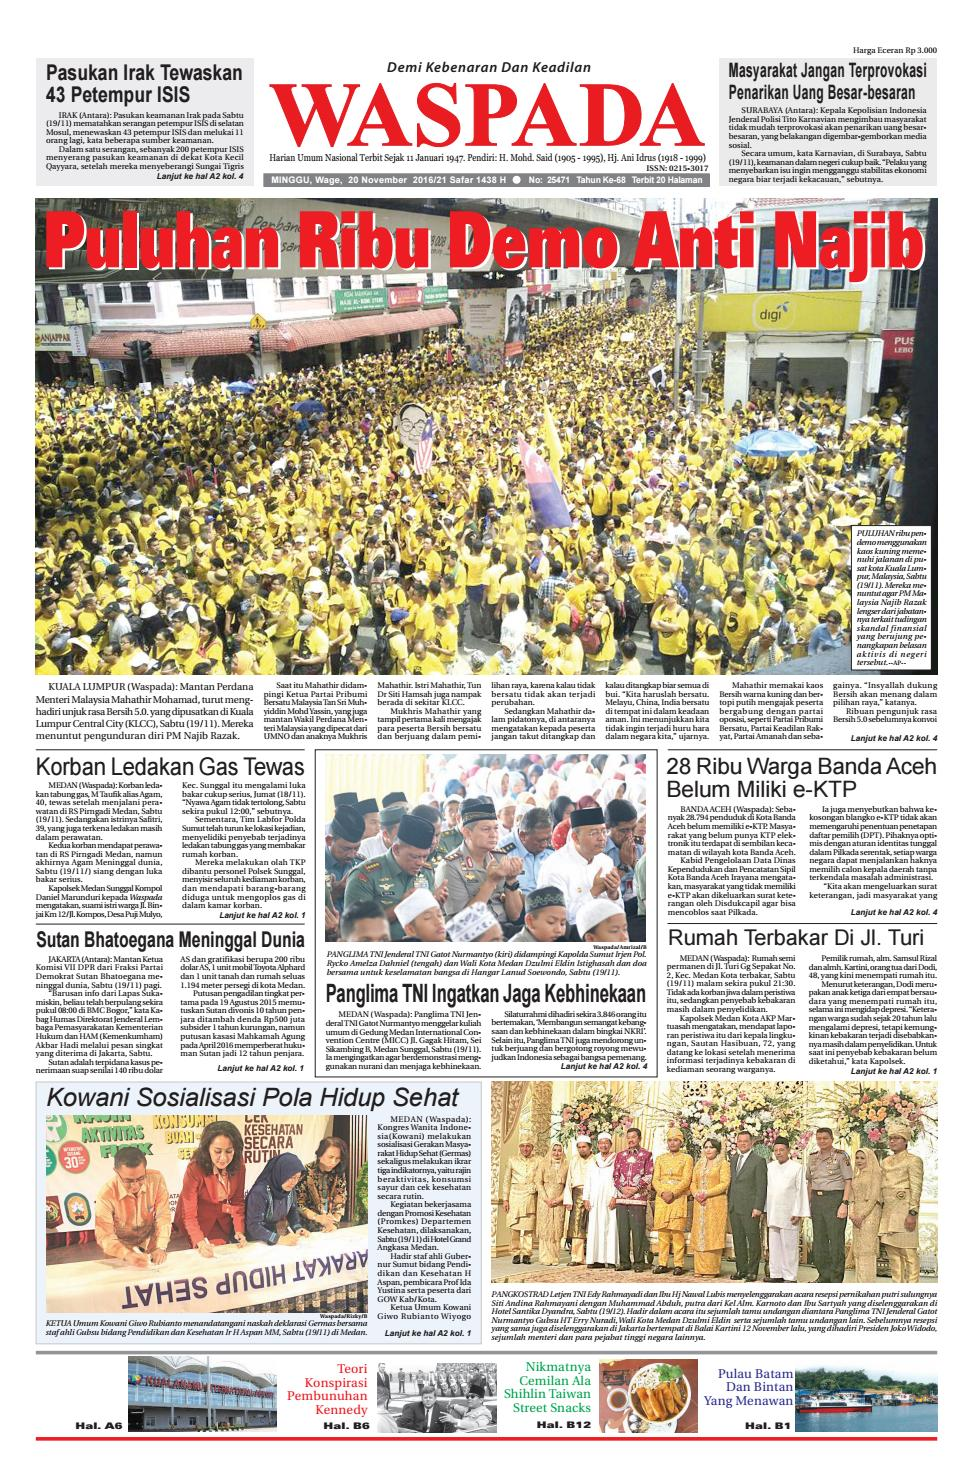 Waspada Minggu 20 November 2016 By Harian Issuu Warior Lc Pendek All Black Sekolah Prsmuka Kerja Santai Main Anak Dewasa